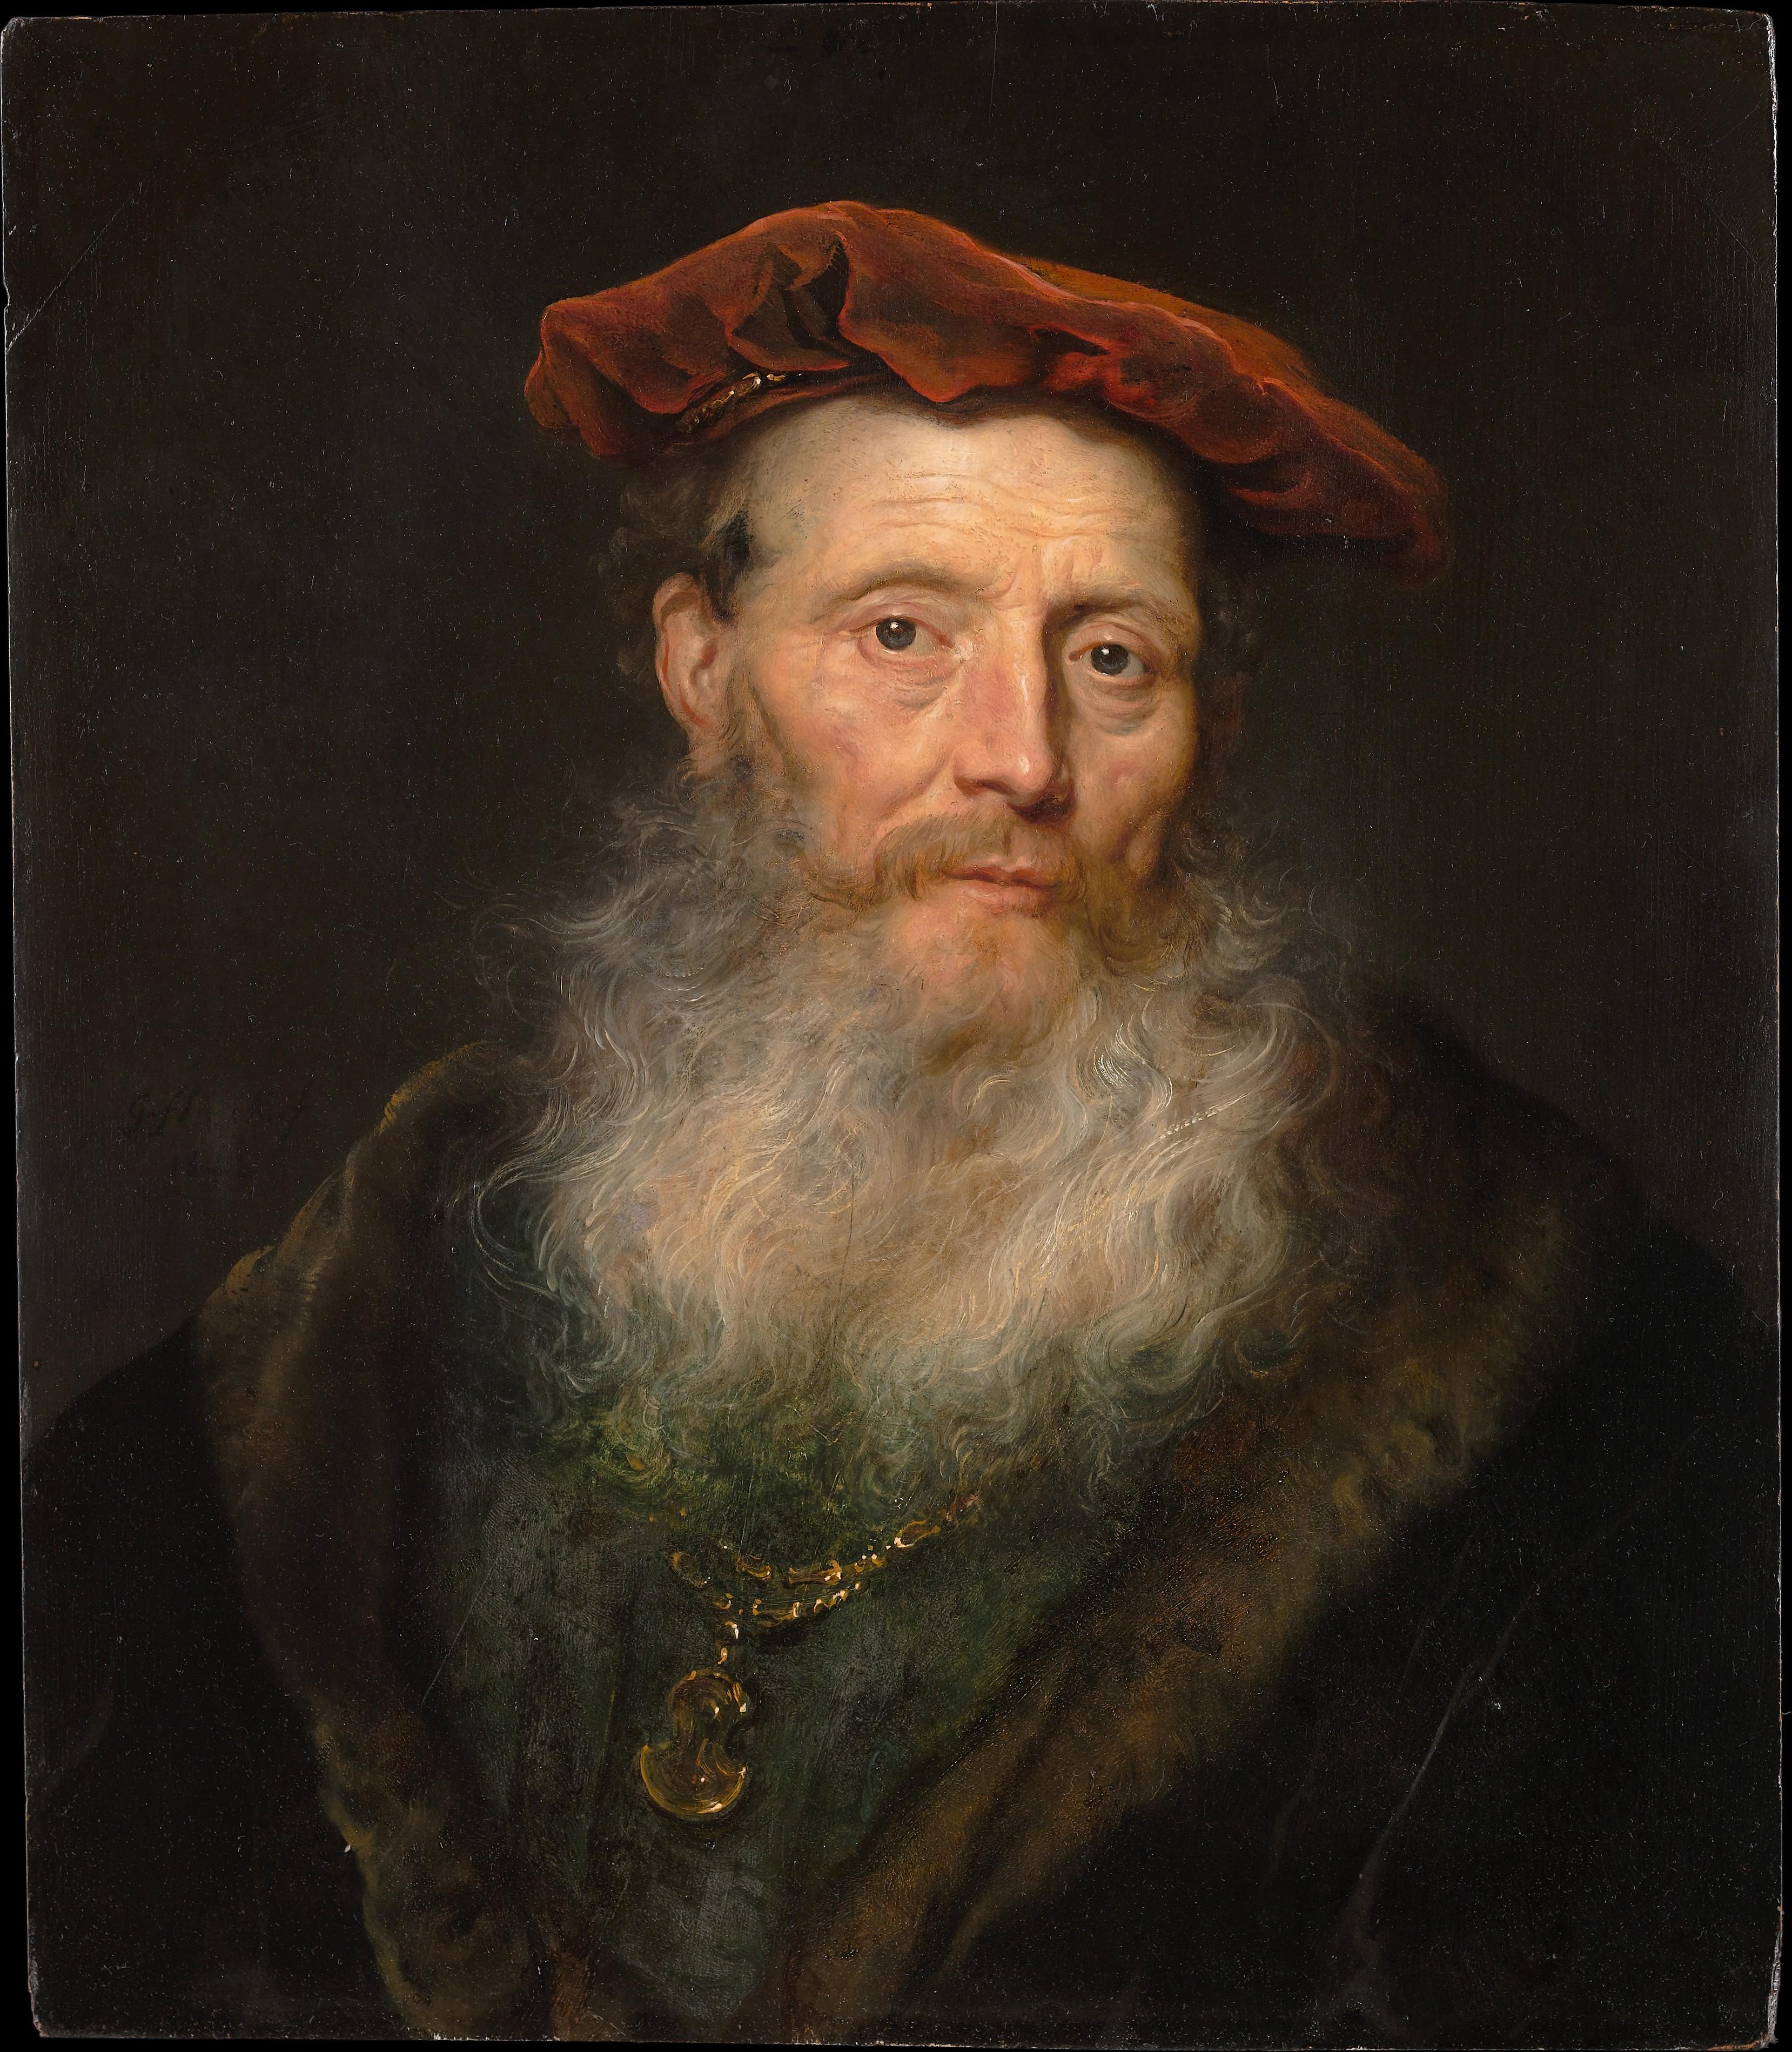 The Bearded Guyp2